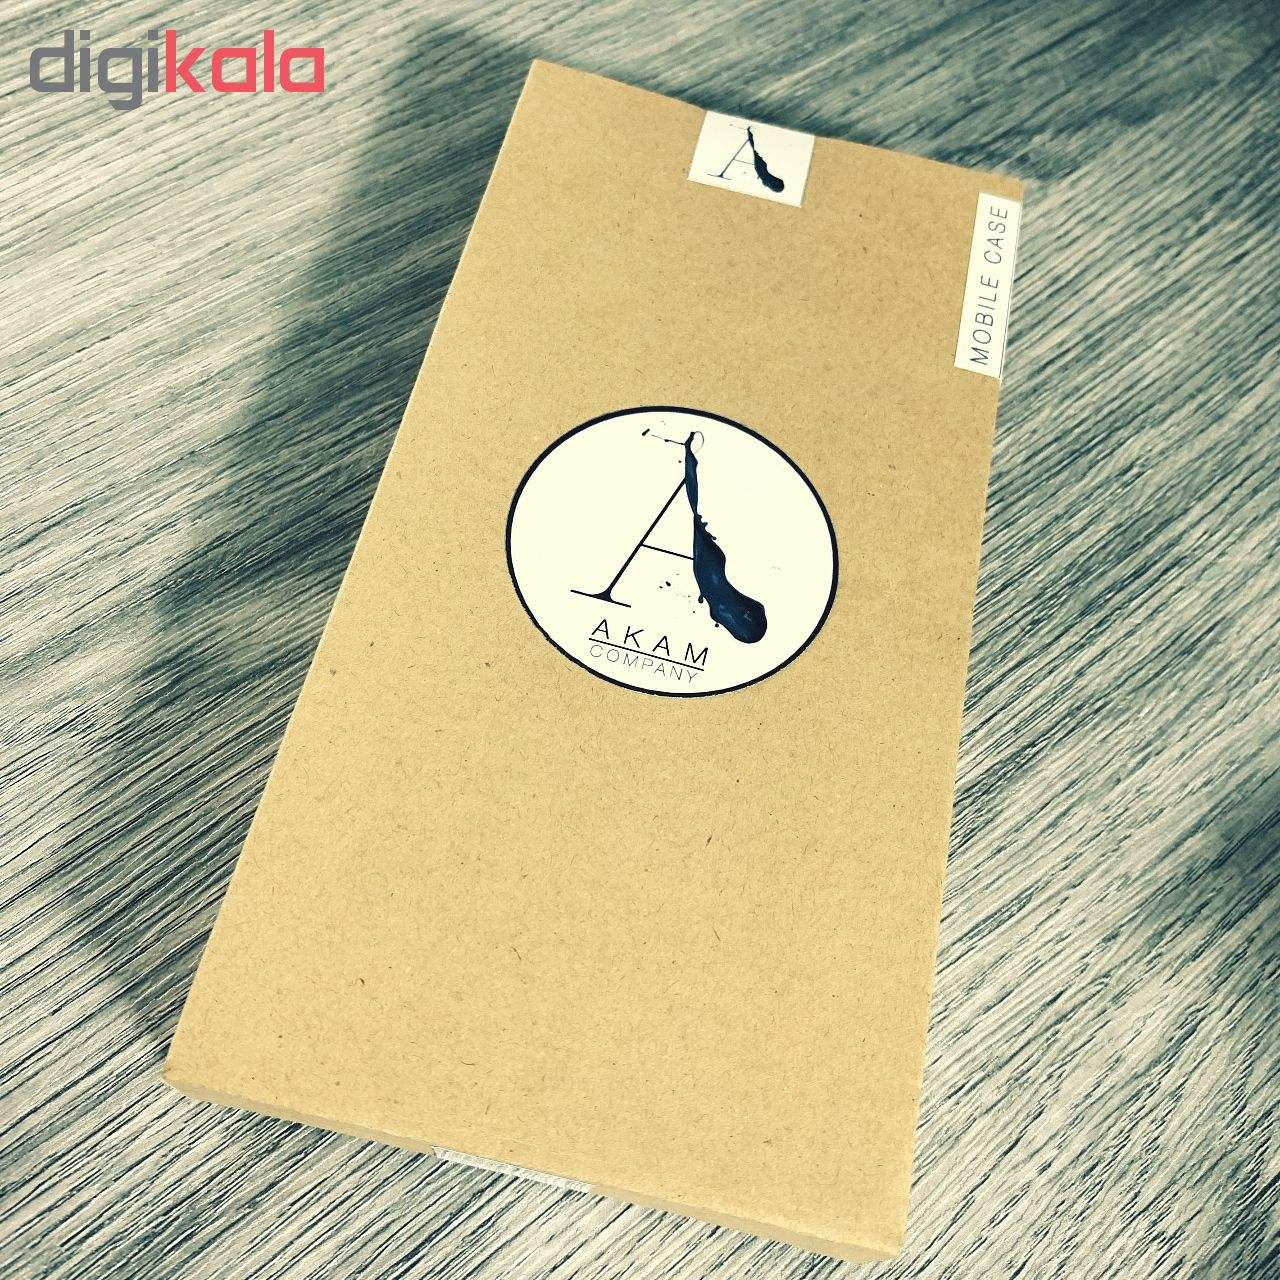 کاور آکام مدل AN90078 مناسب برای گوشی موبایل سامسونگ Galaxy Note 9 main 1 2